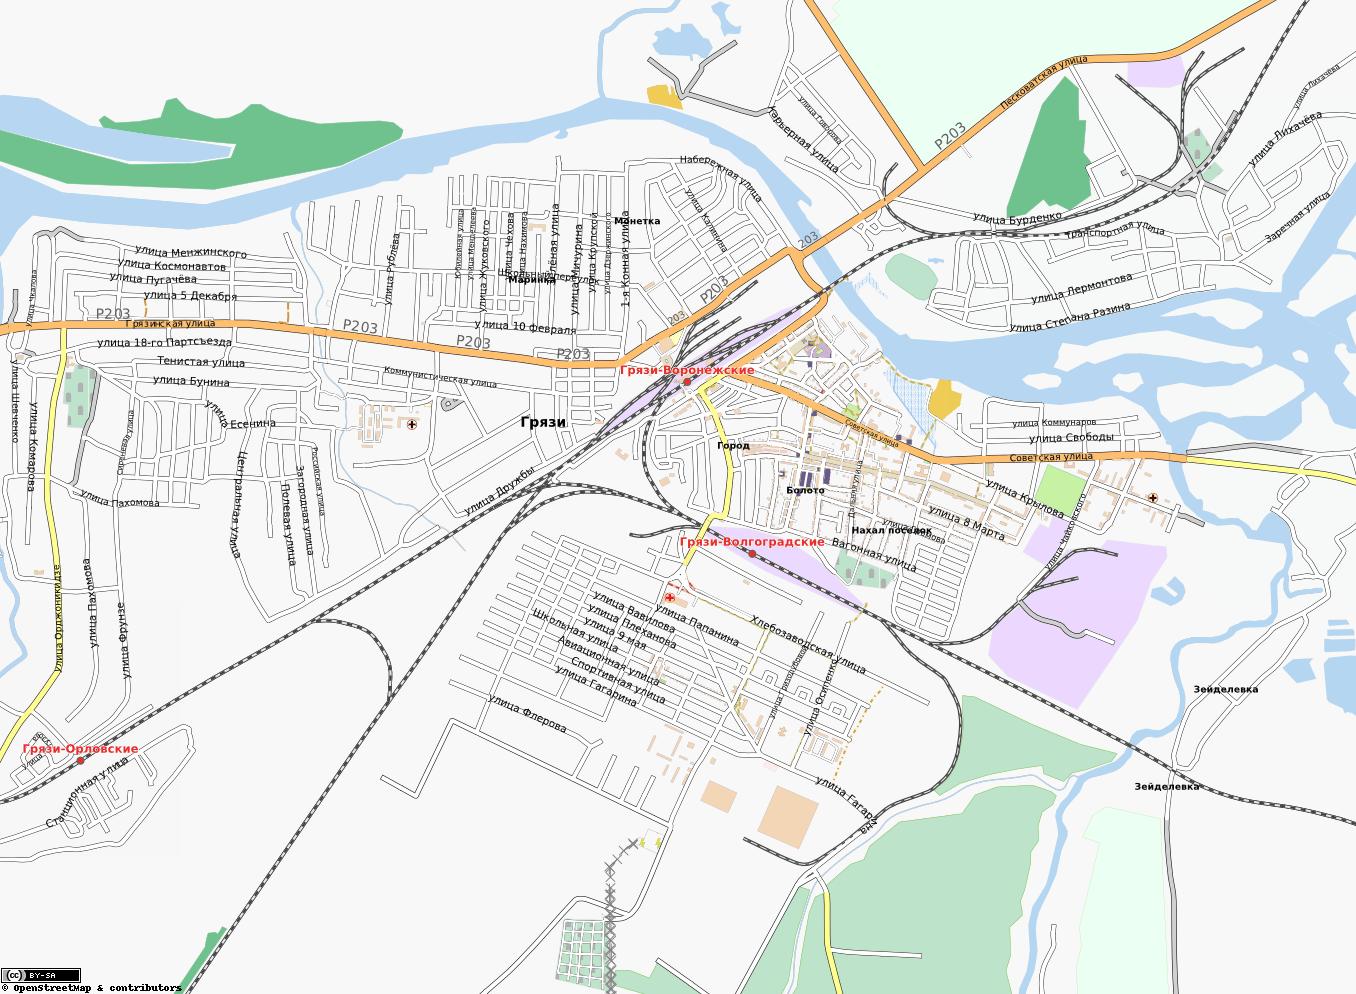 Карты городов и регионов России - каталог: http://mapcatalog.ru/rus/city.php?sub_id=58&fed_id=4